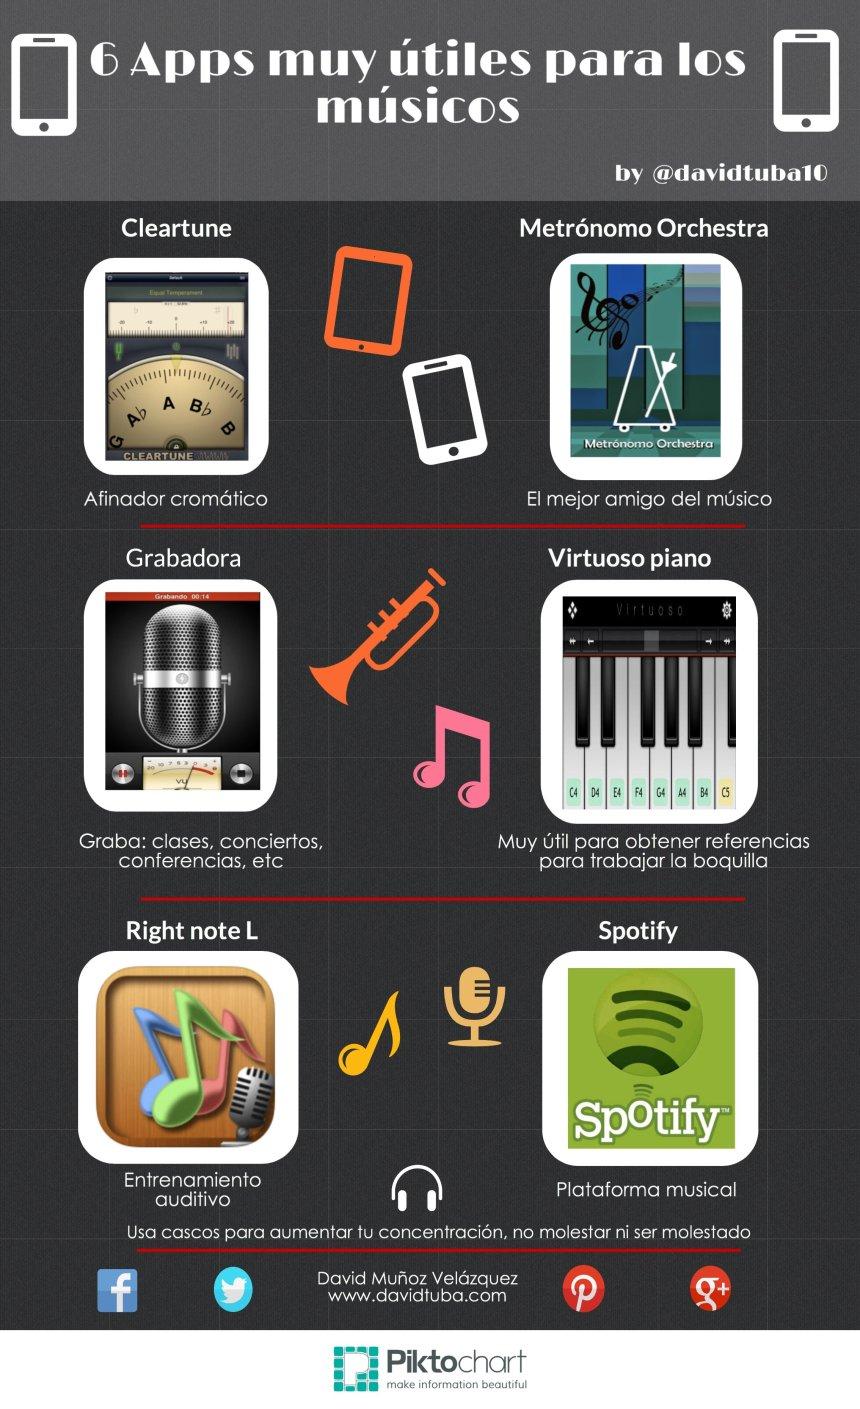 6 APPs útiles para músicos